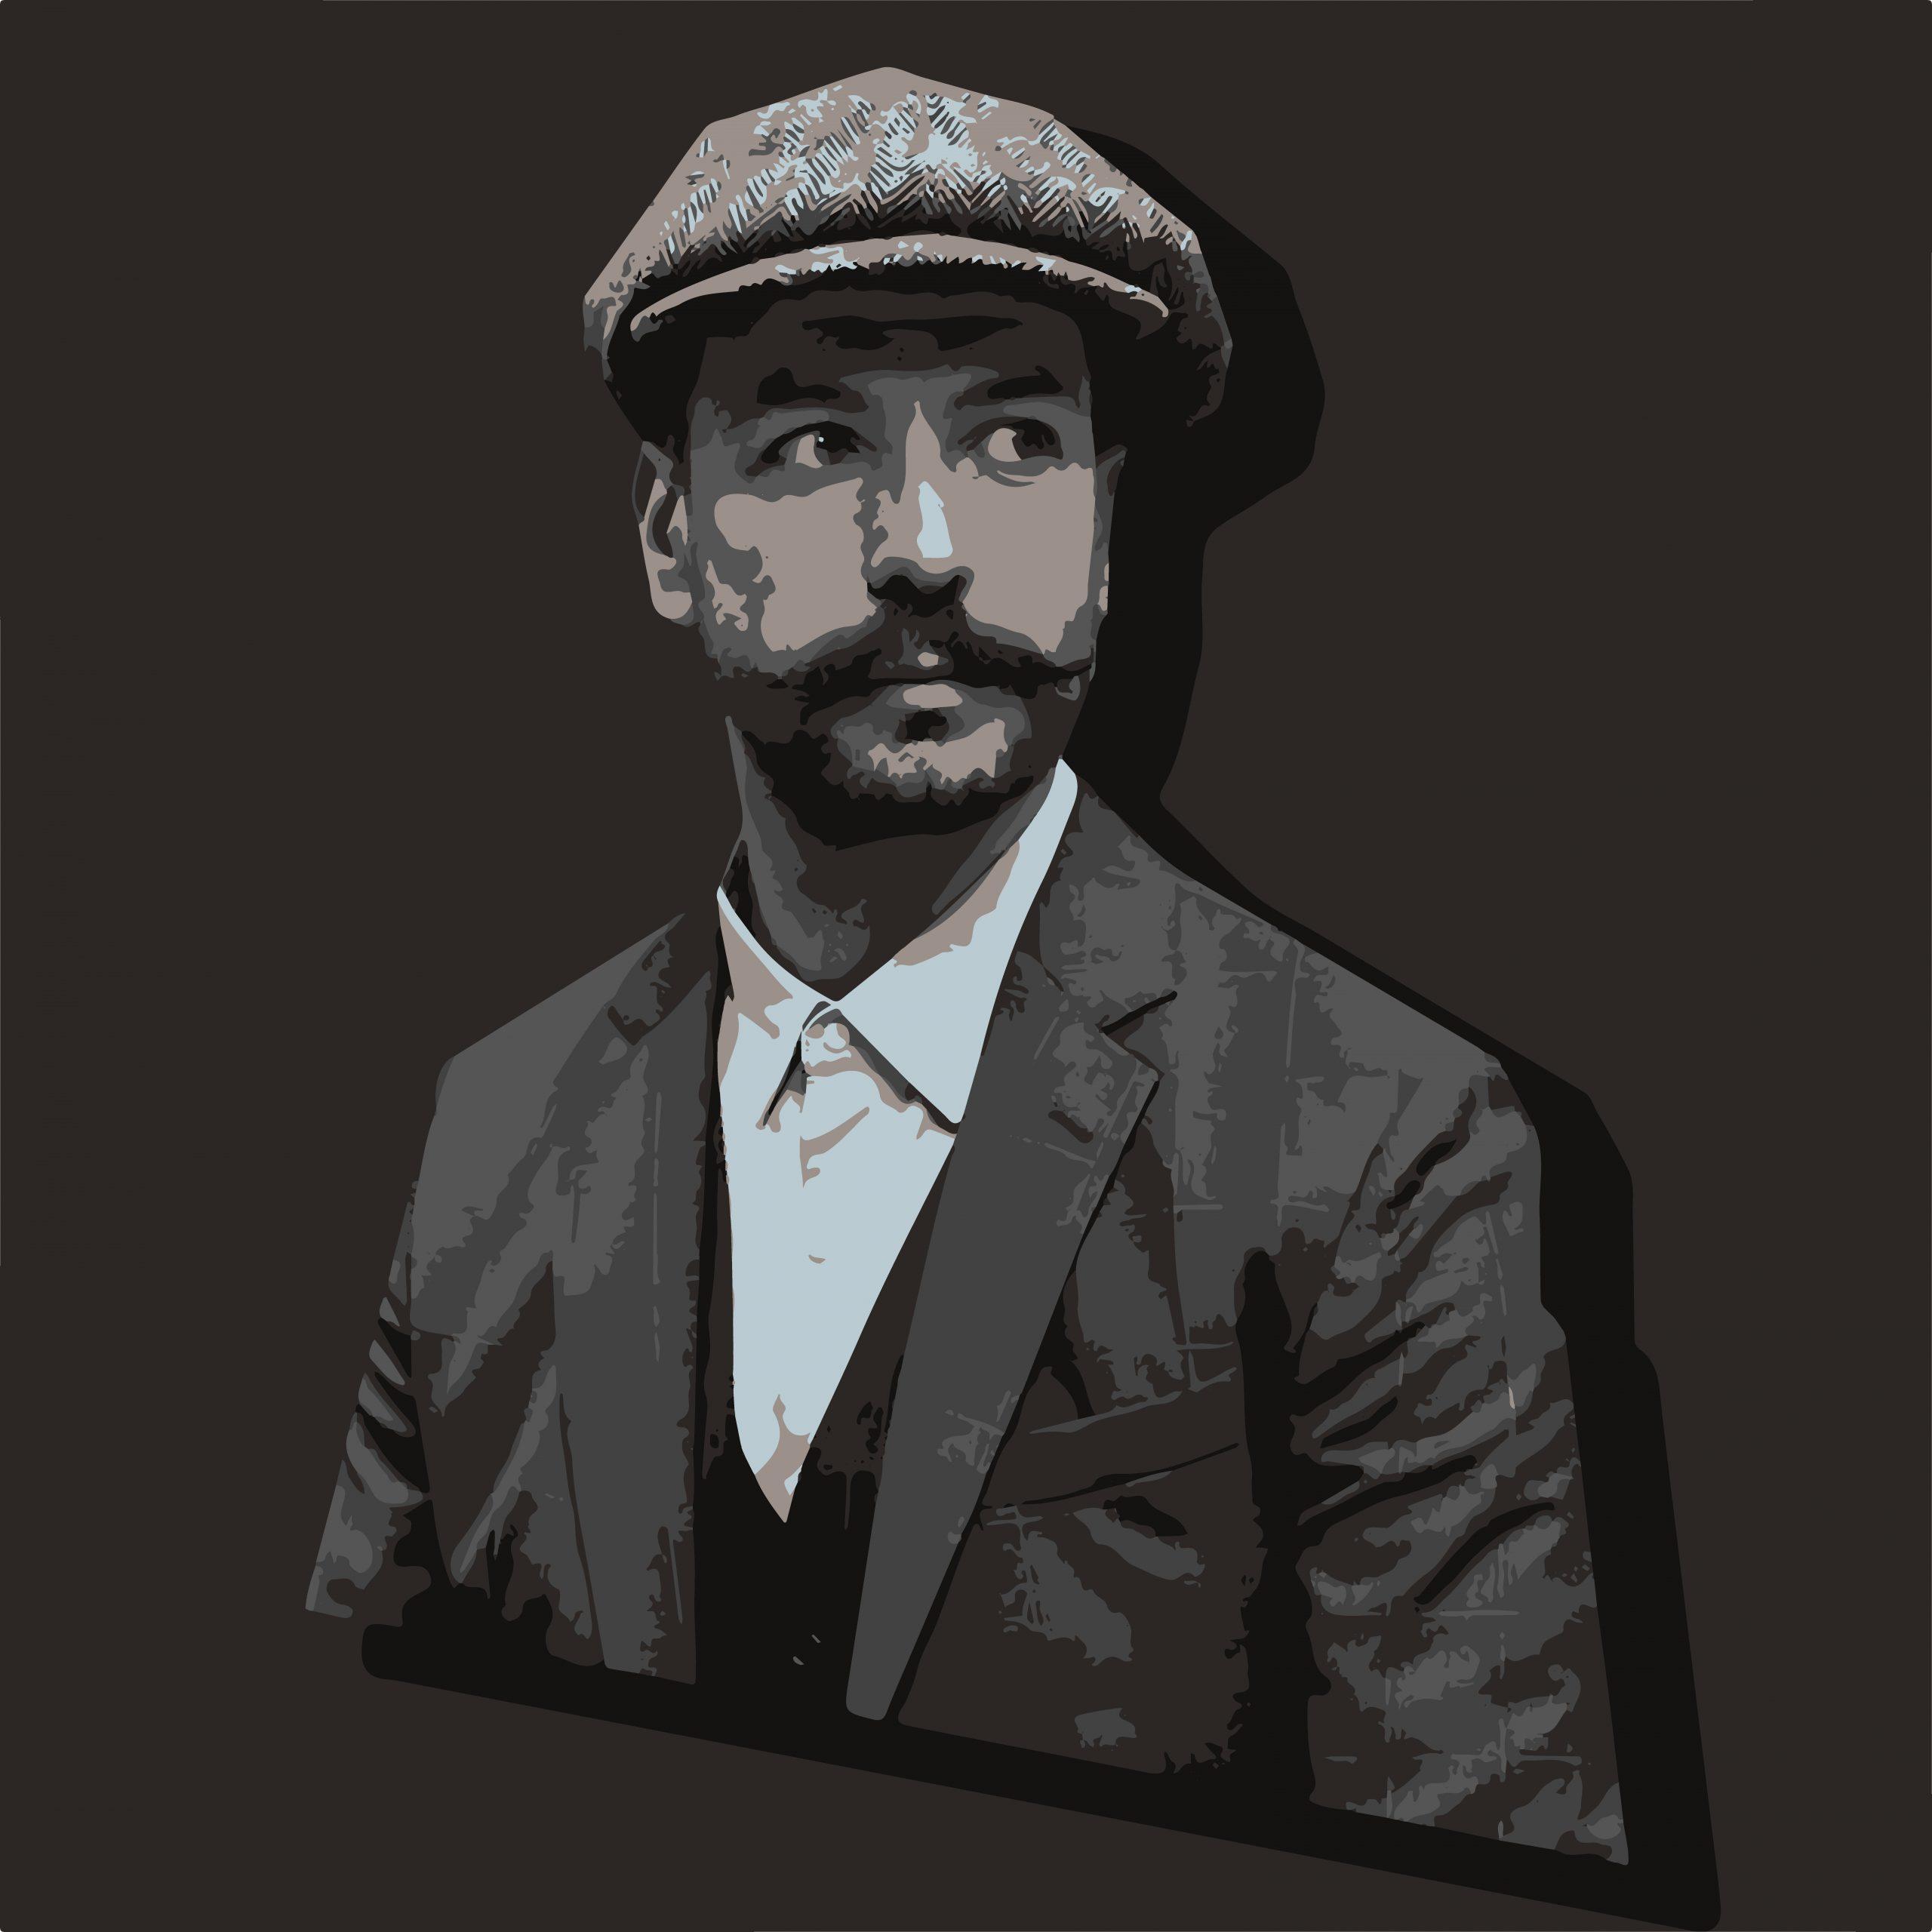 Portrait illustration of a man